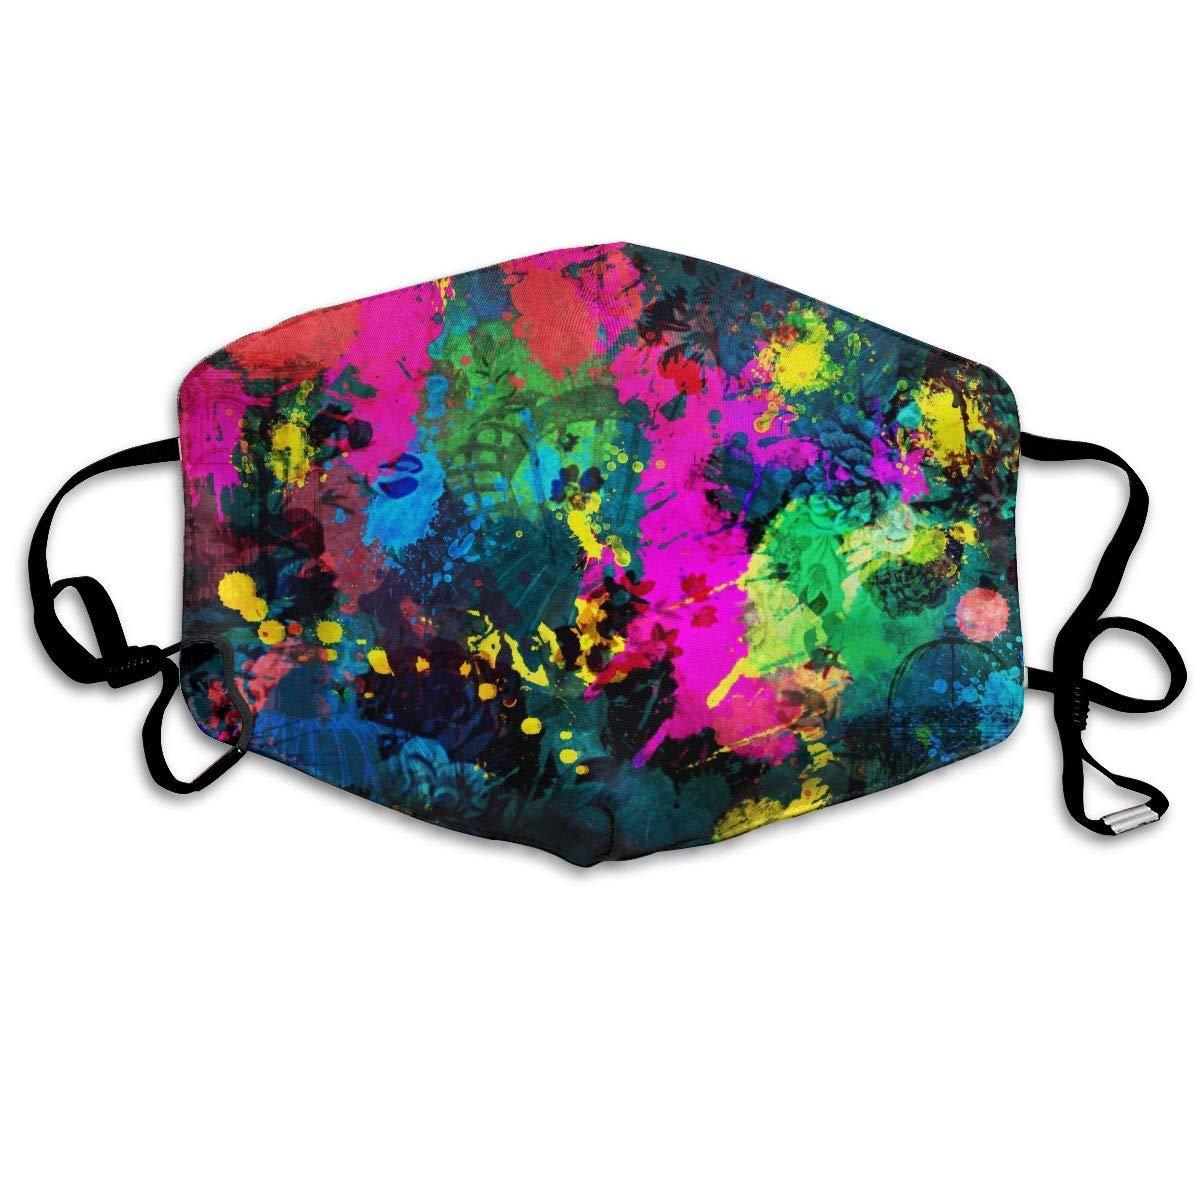 Daawqee Máscara de Boca, Color Paint Splatter Adult Creative Mascarilla Washable Safety 100% Polyester Comfortable Breathable Health Half Face Masks